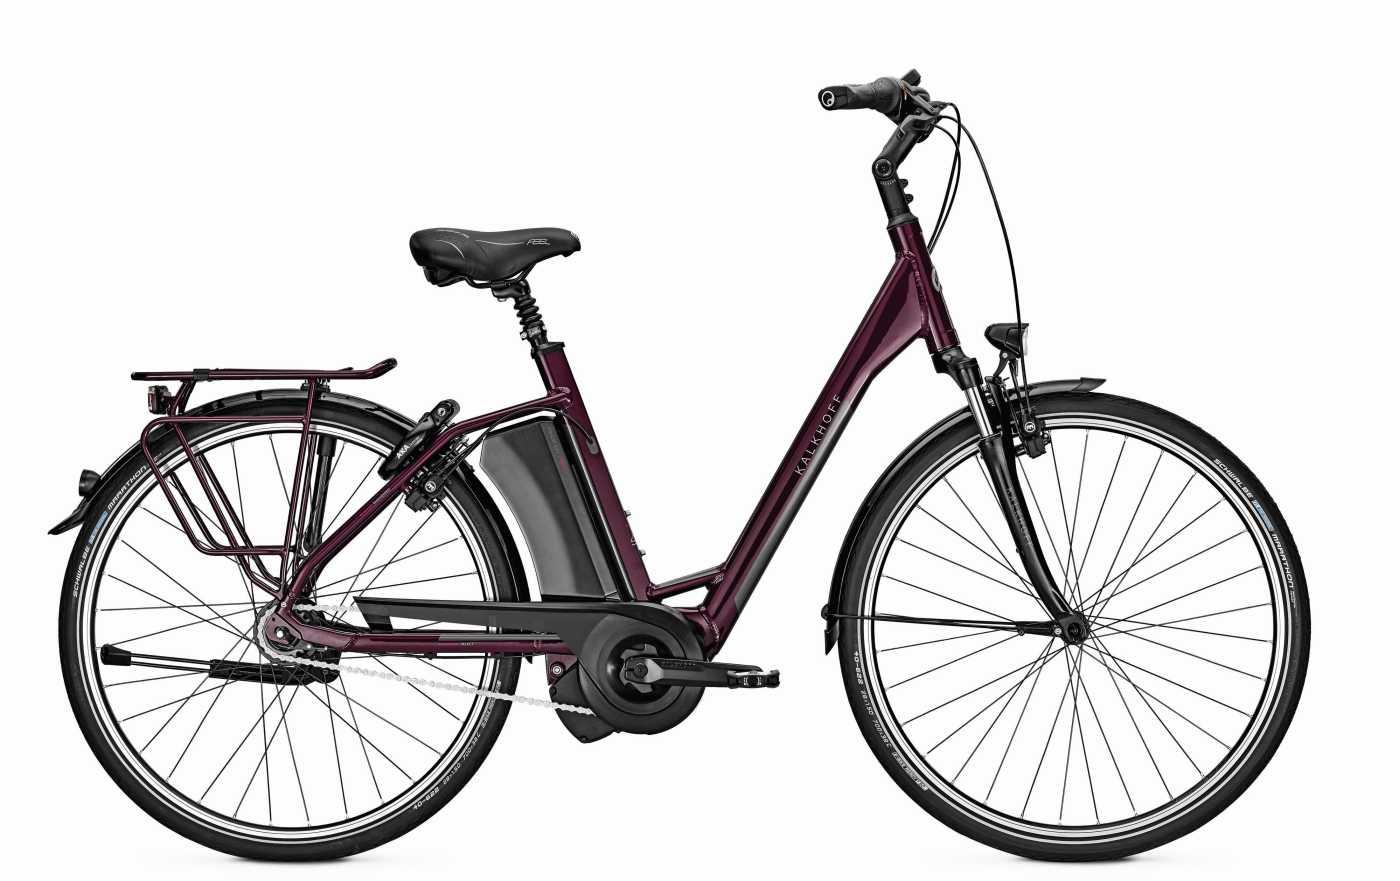 Kalkhoff Select Shimano 8 2017 Tiefeinsteiger violett